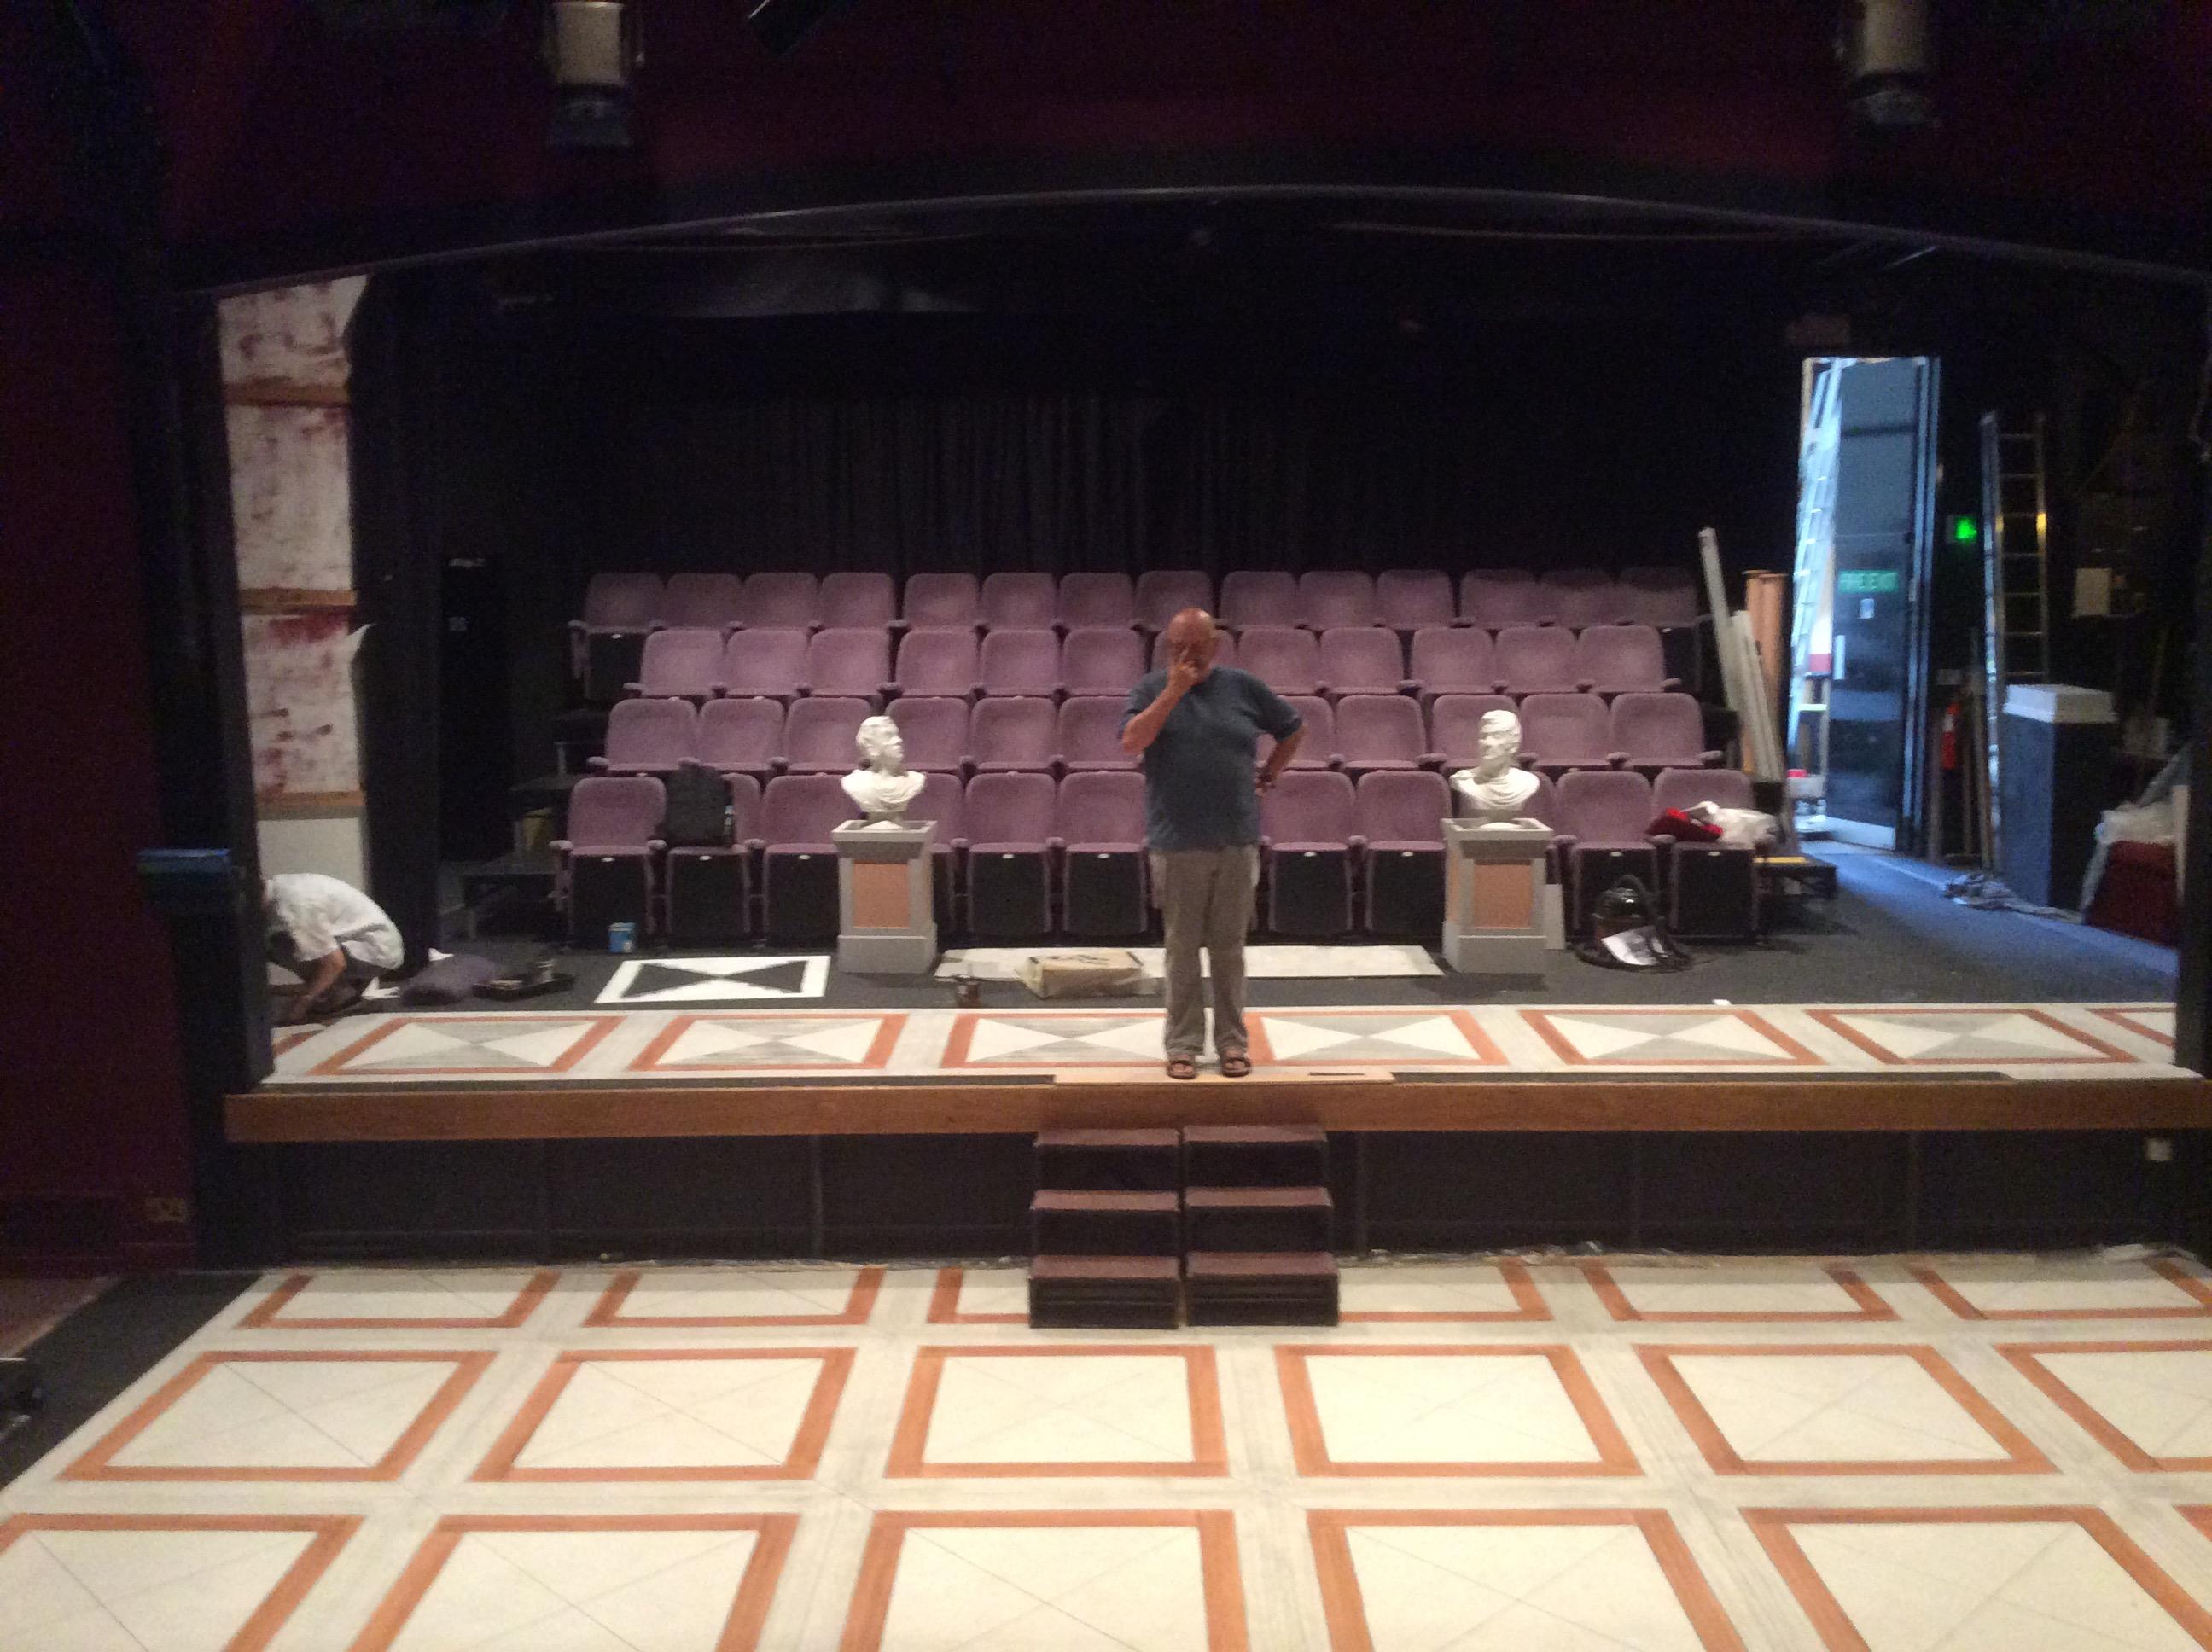 Miller Center stage